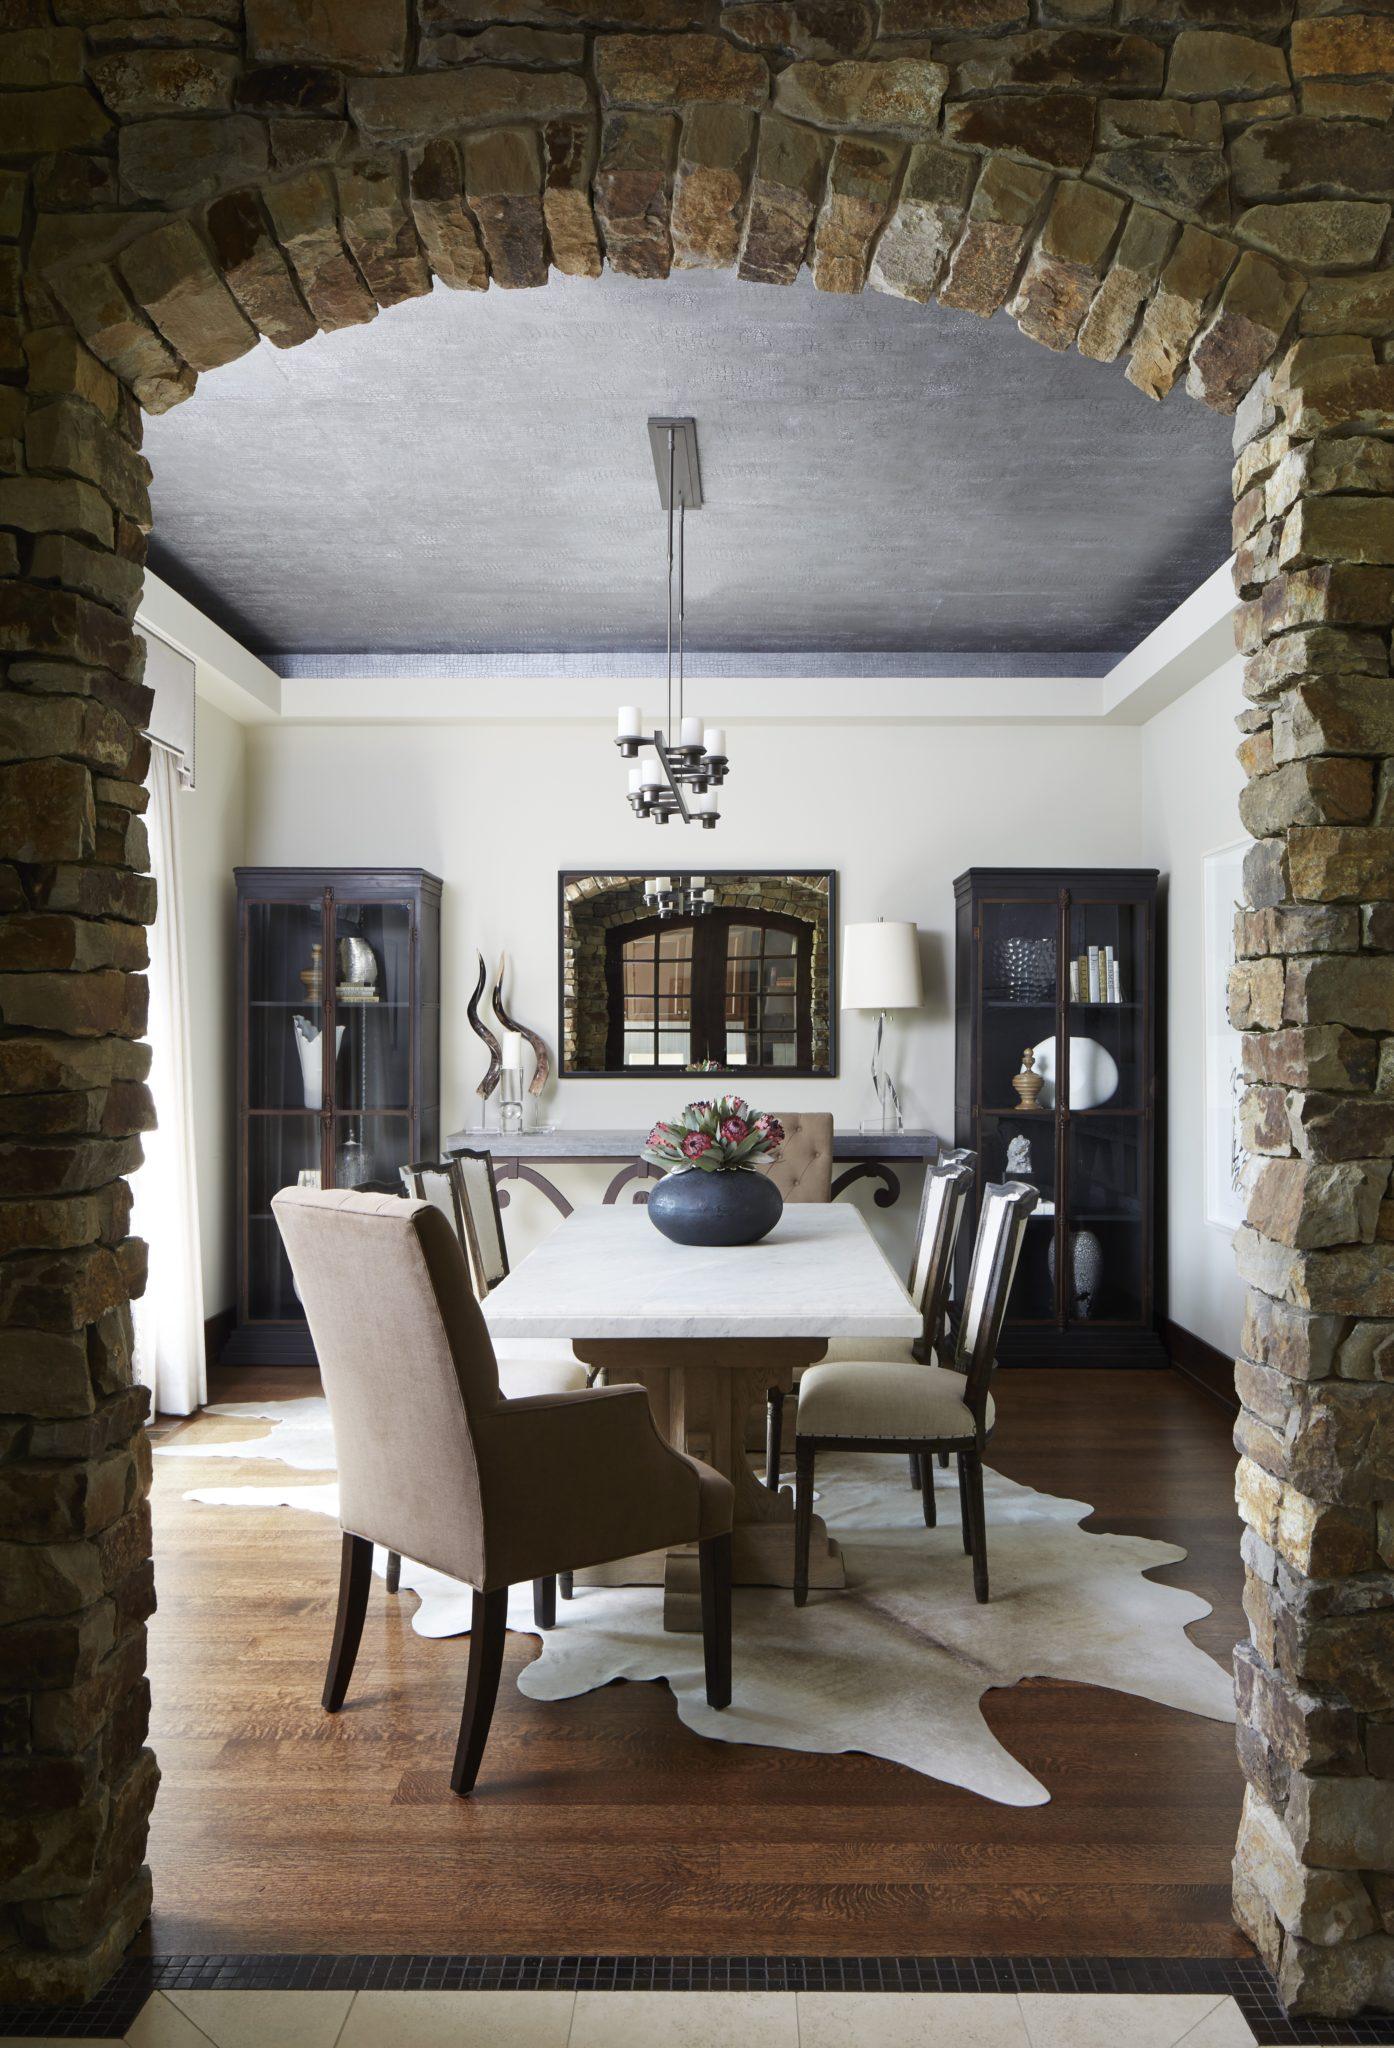 Mountain-Inspired Home Design - Dining by Studio Brunstrum